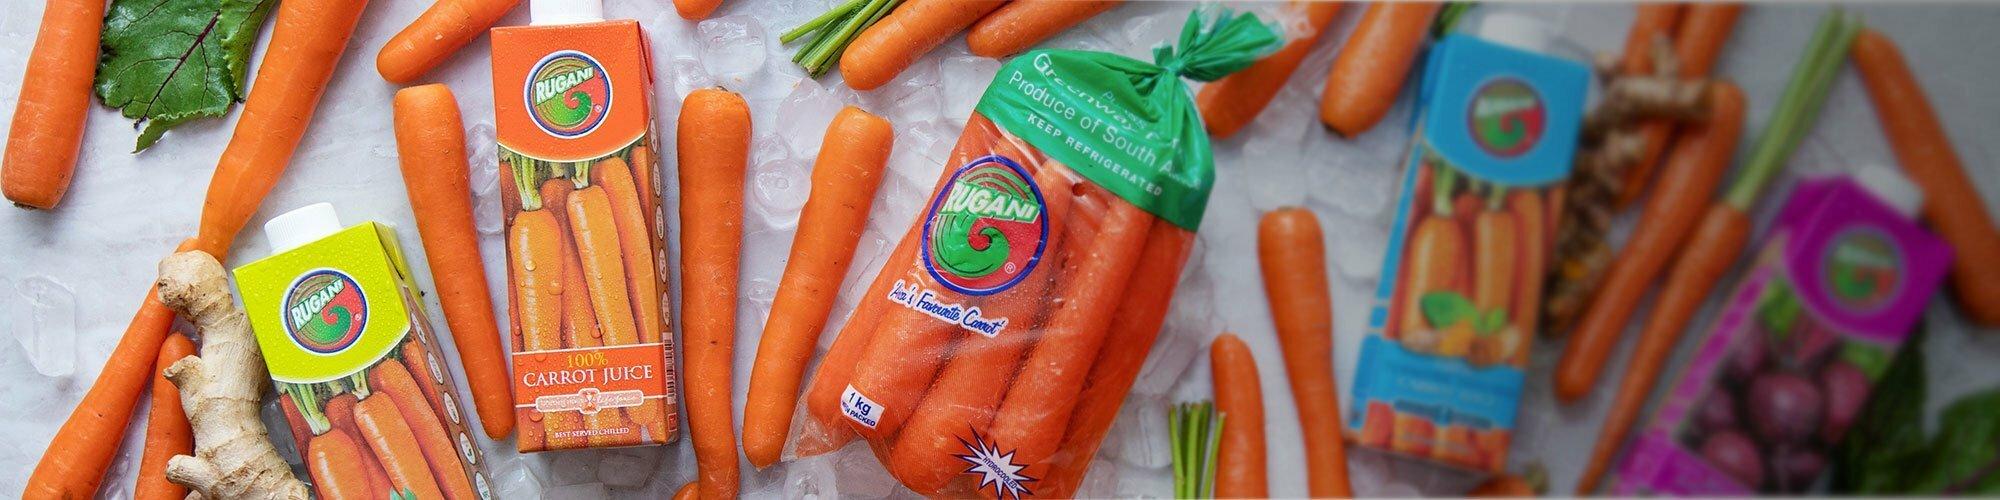 Rugani Juice and carrots